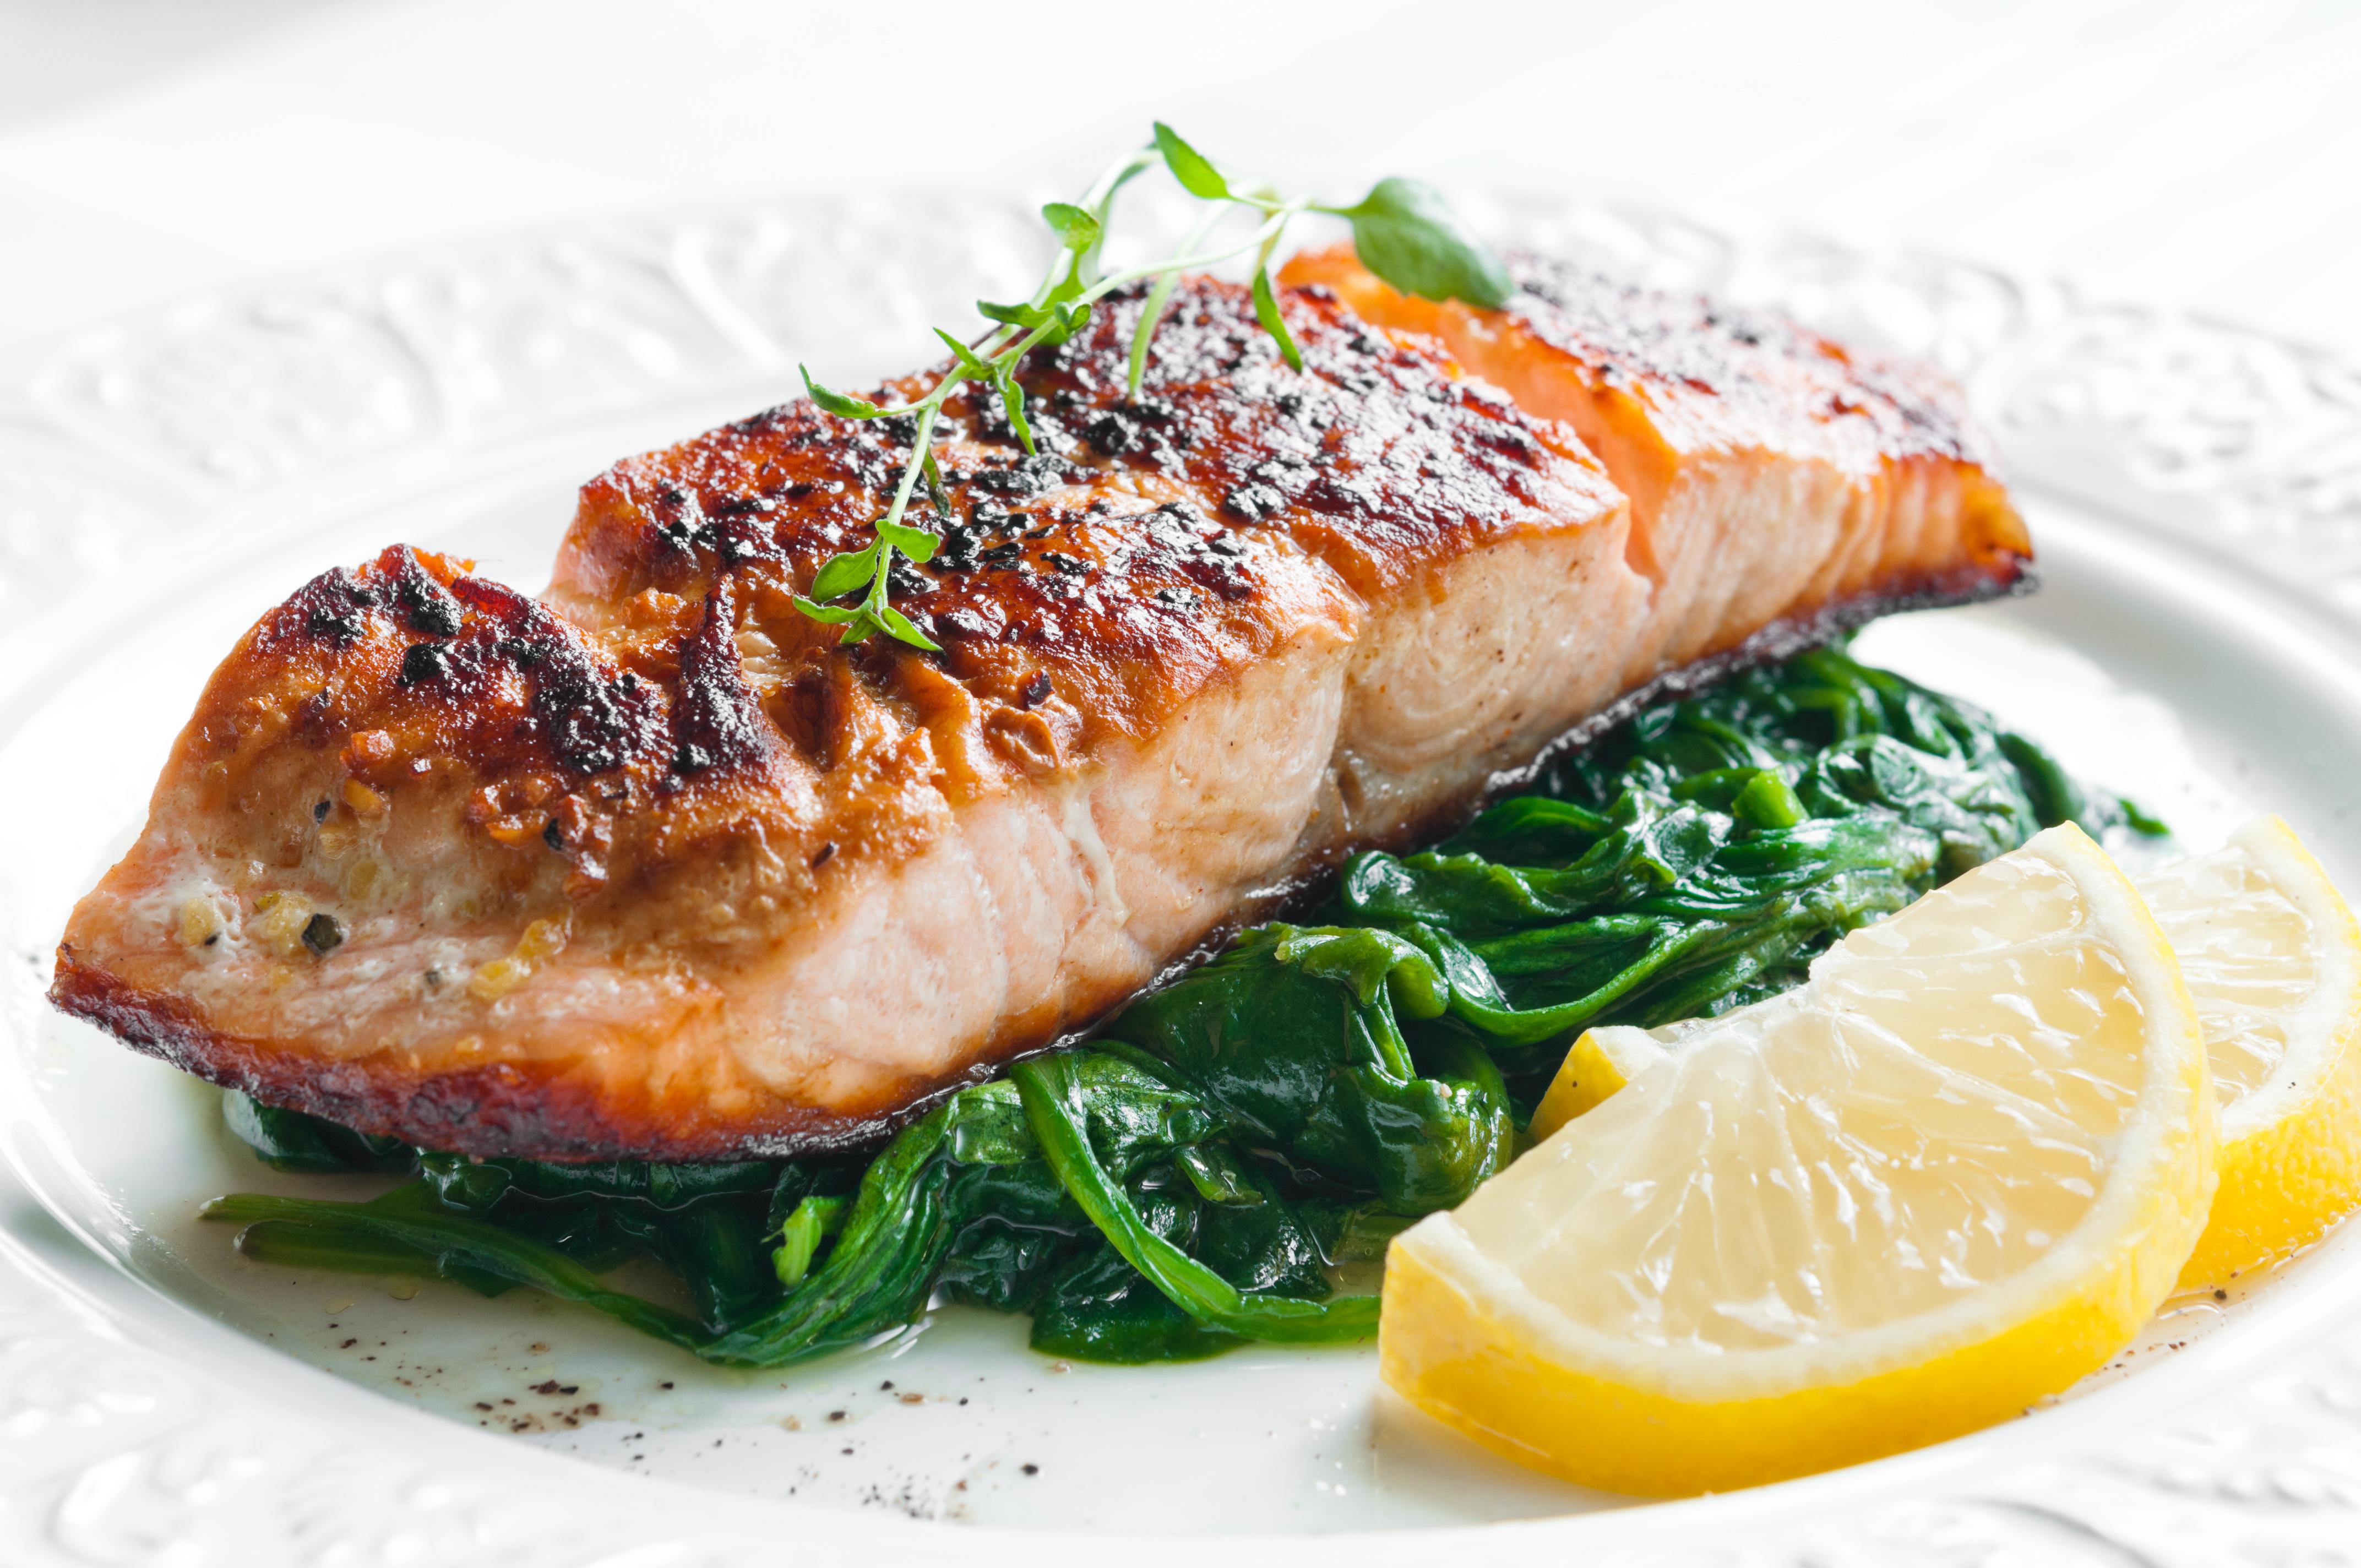 Pan Seared Salmon with Lemon Jus